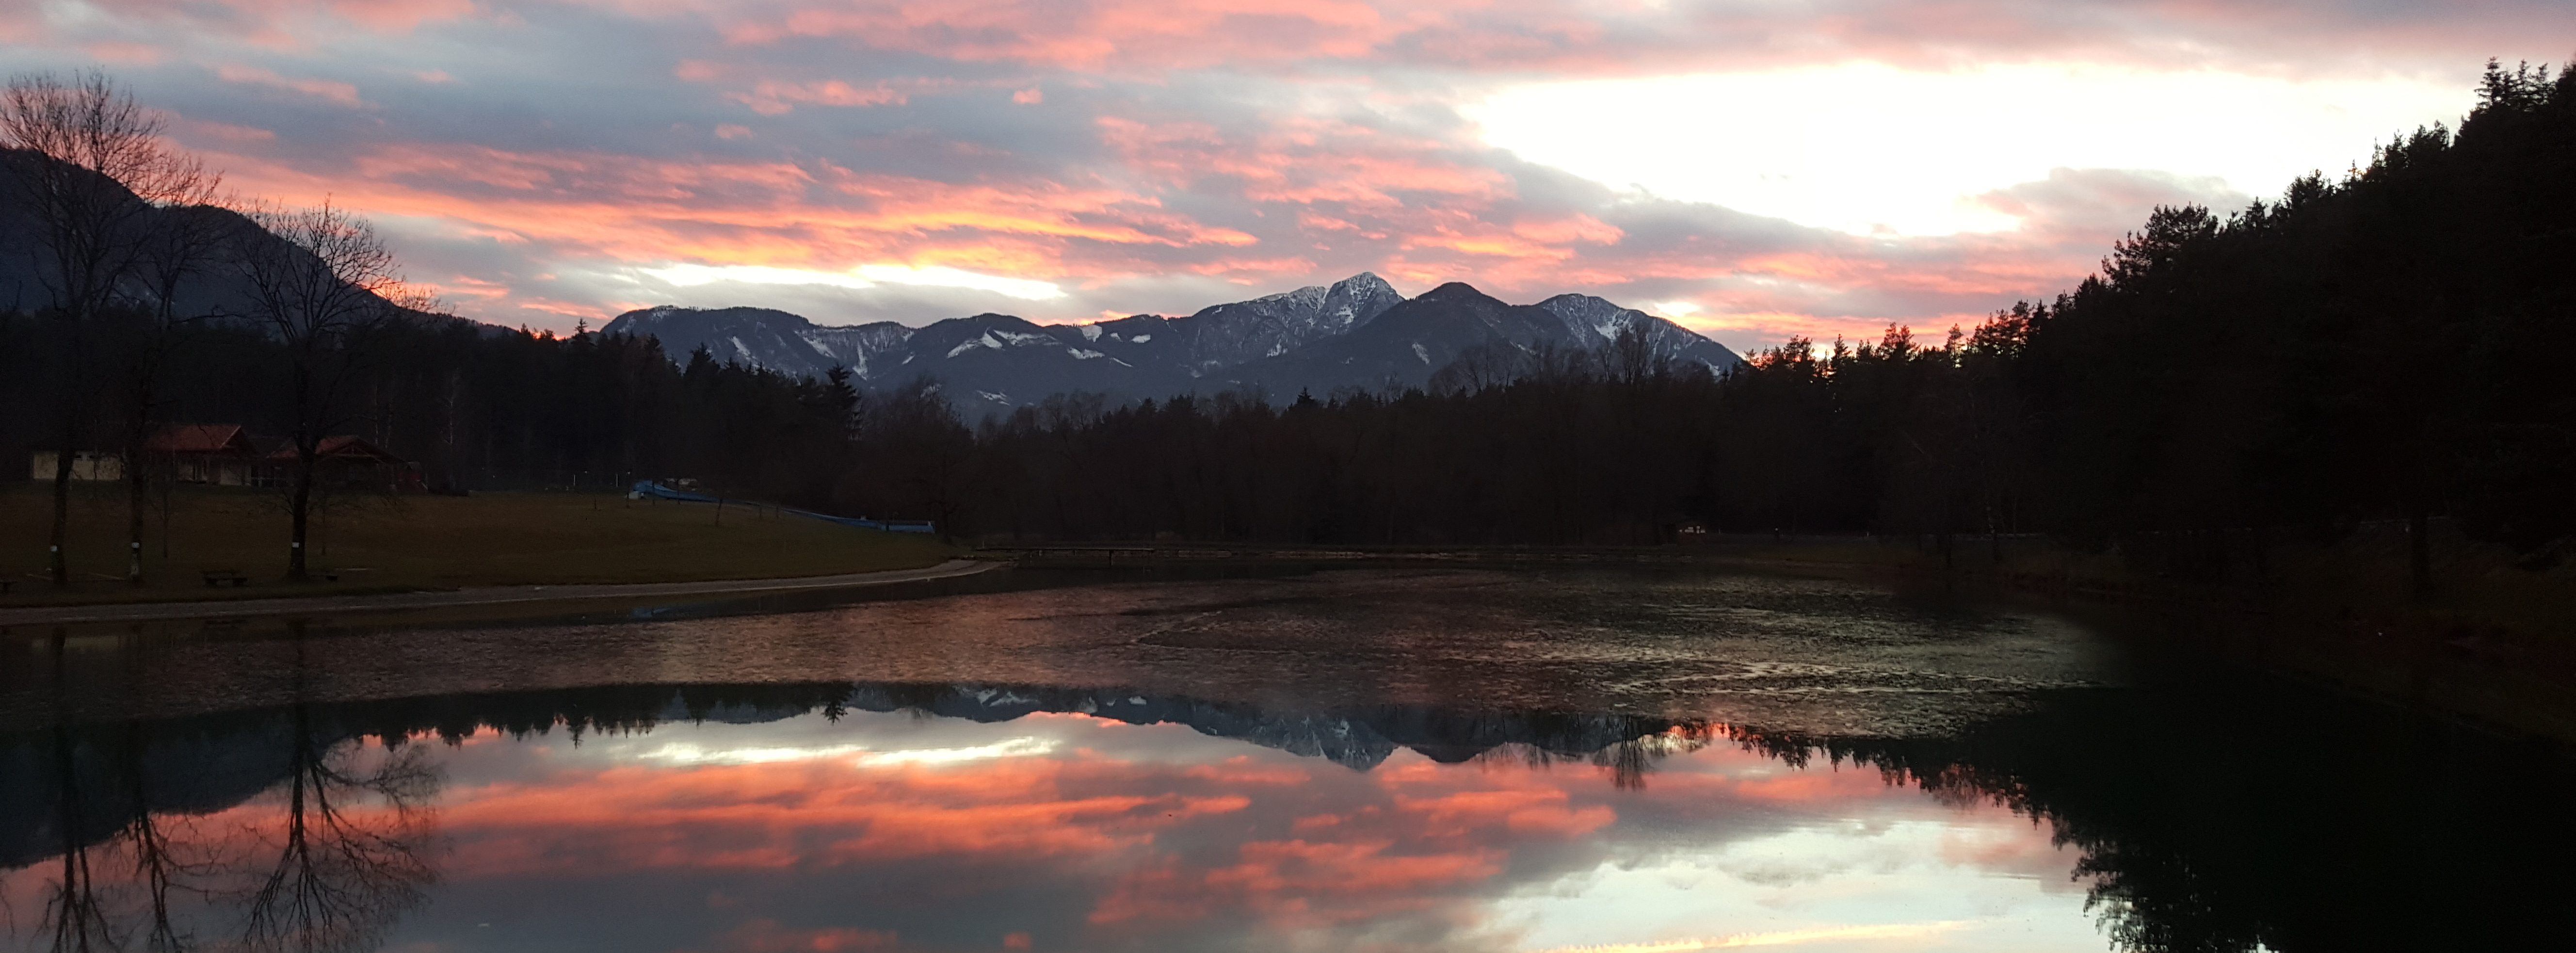 Sonneggersee in Kärnten Ferienwohungen Jernej Katharina